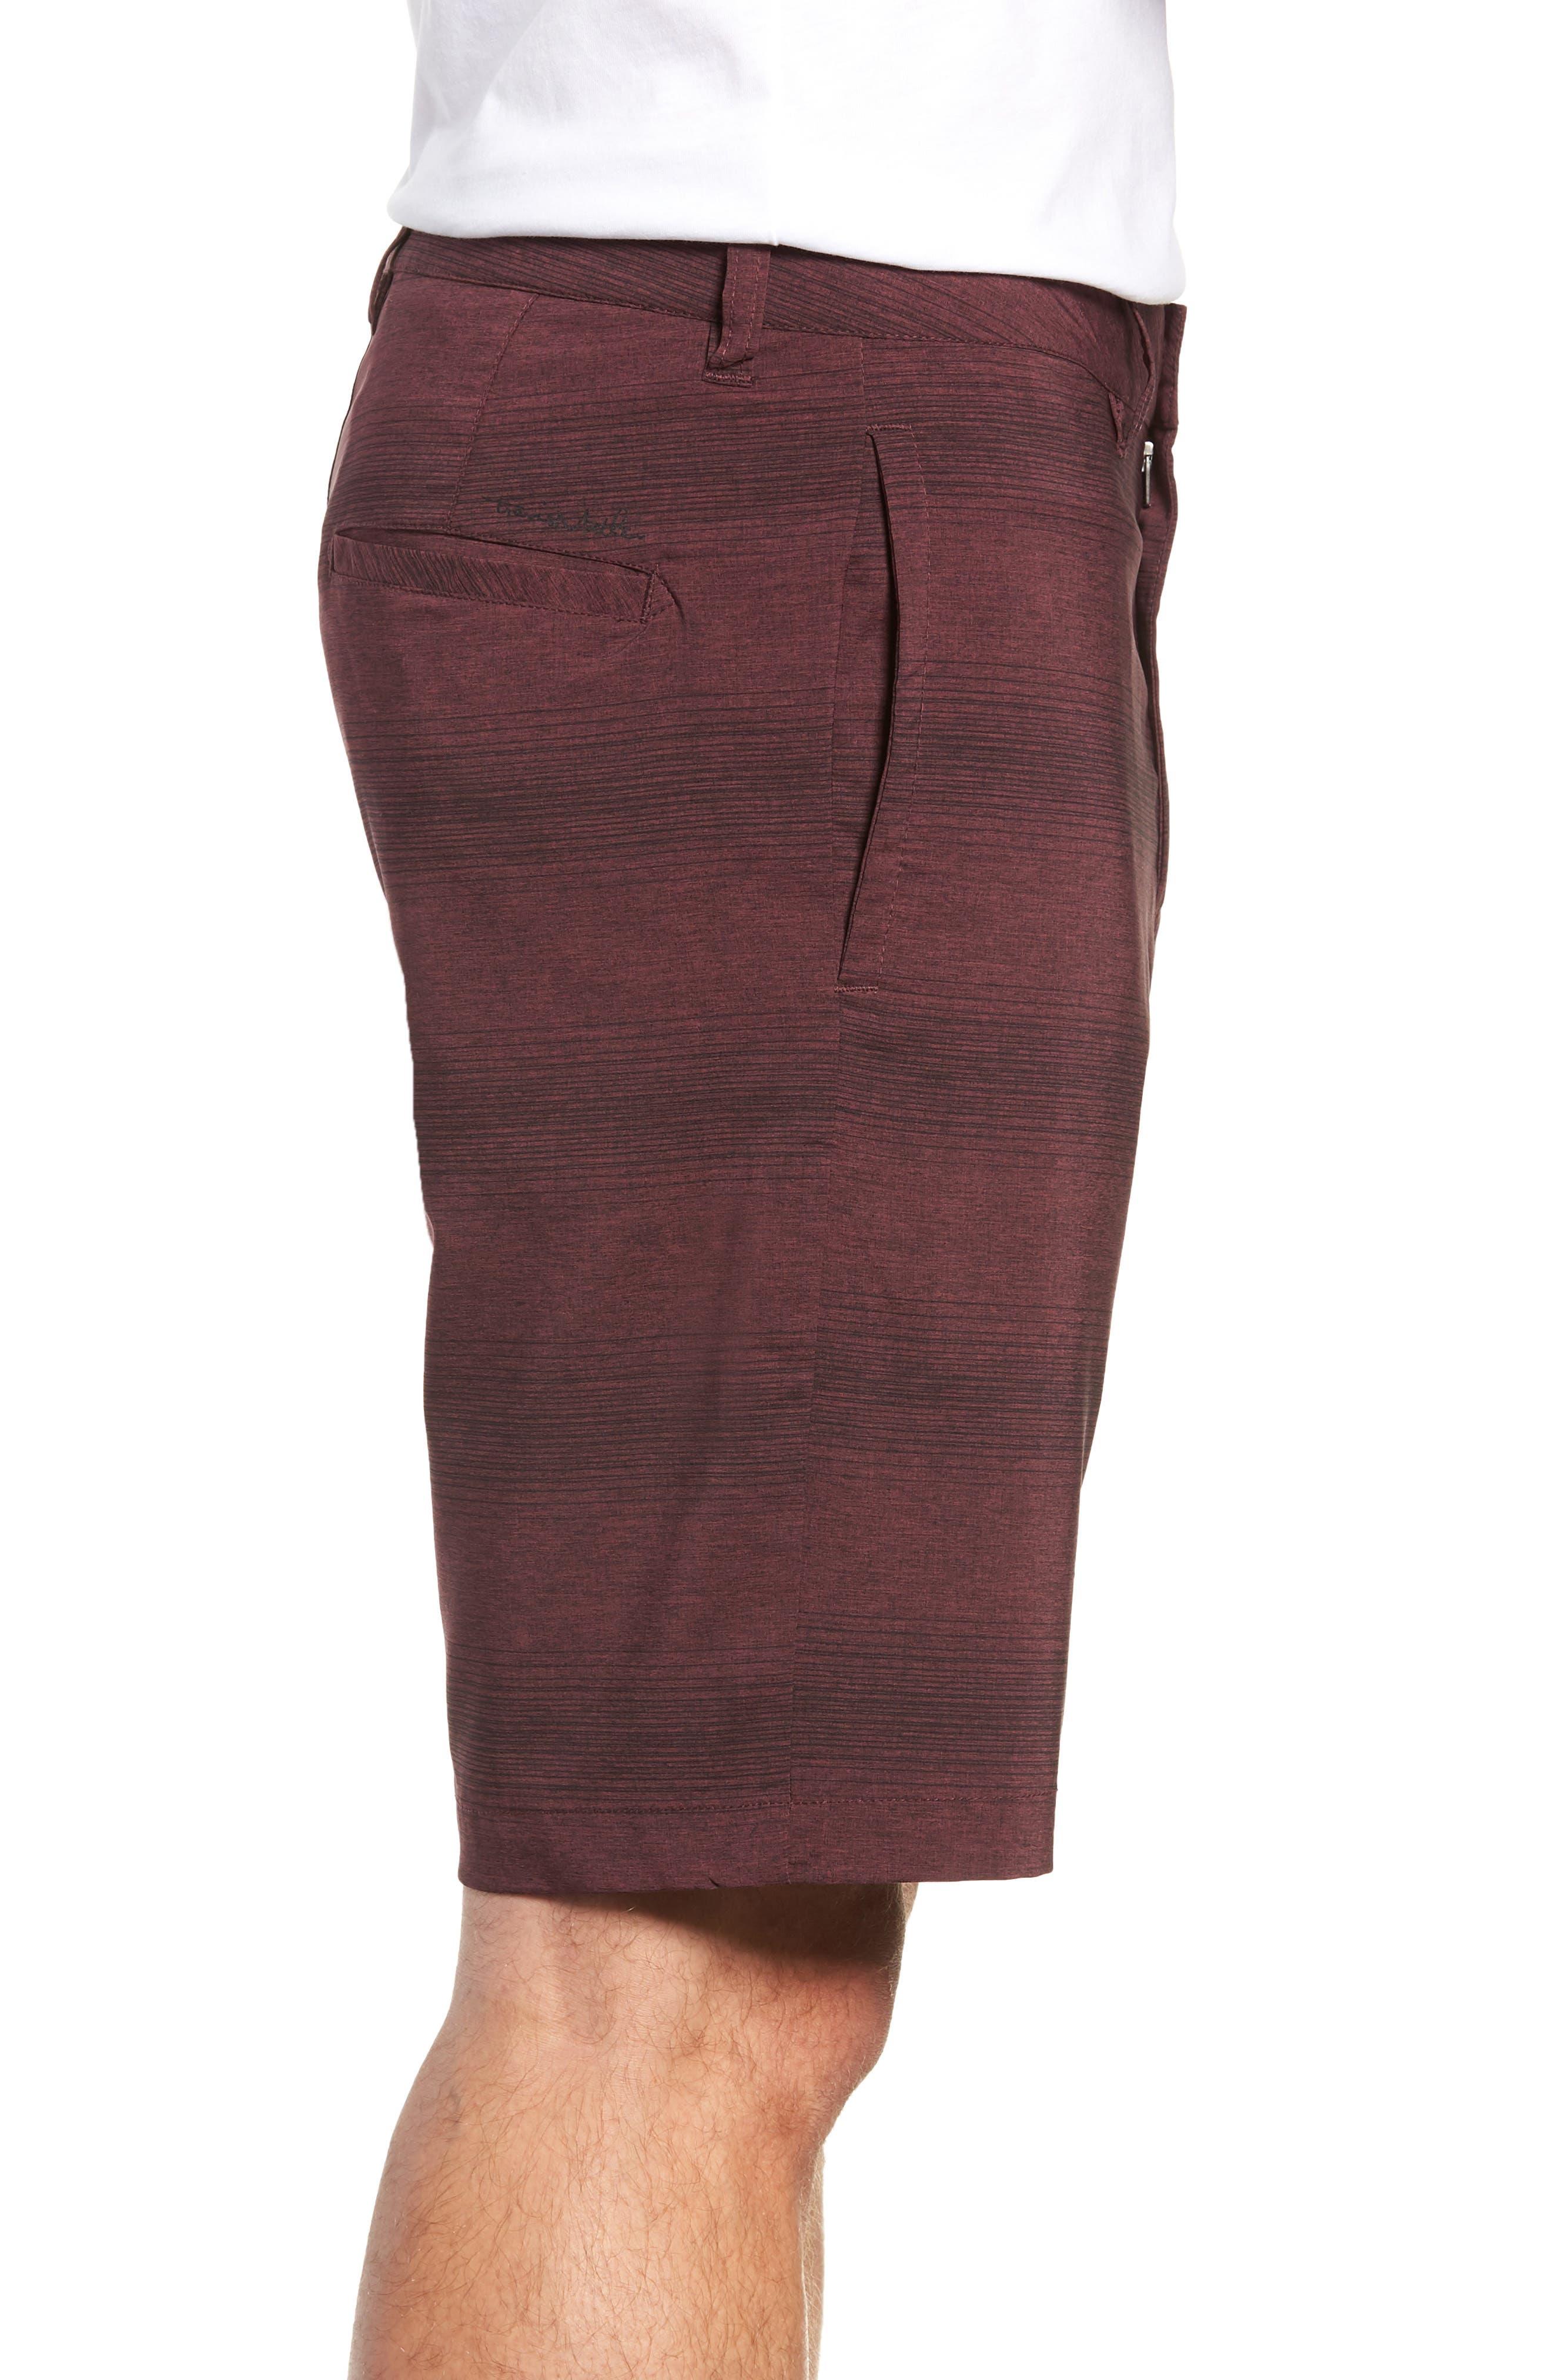 TRAVISMATHEW, Tepic Shorts, Alternate thumbnail 3, color, WINETASTING/ BLACK